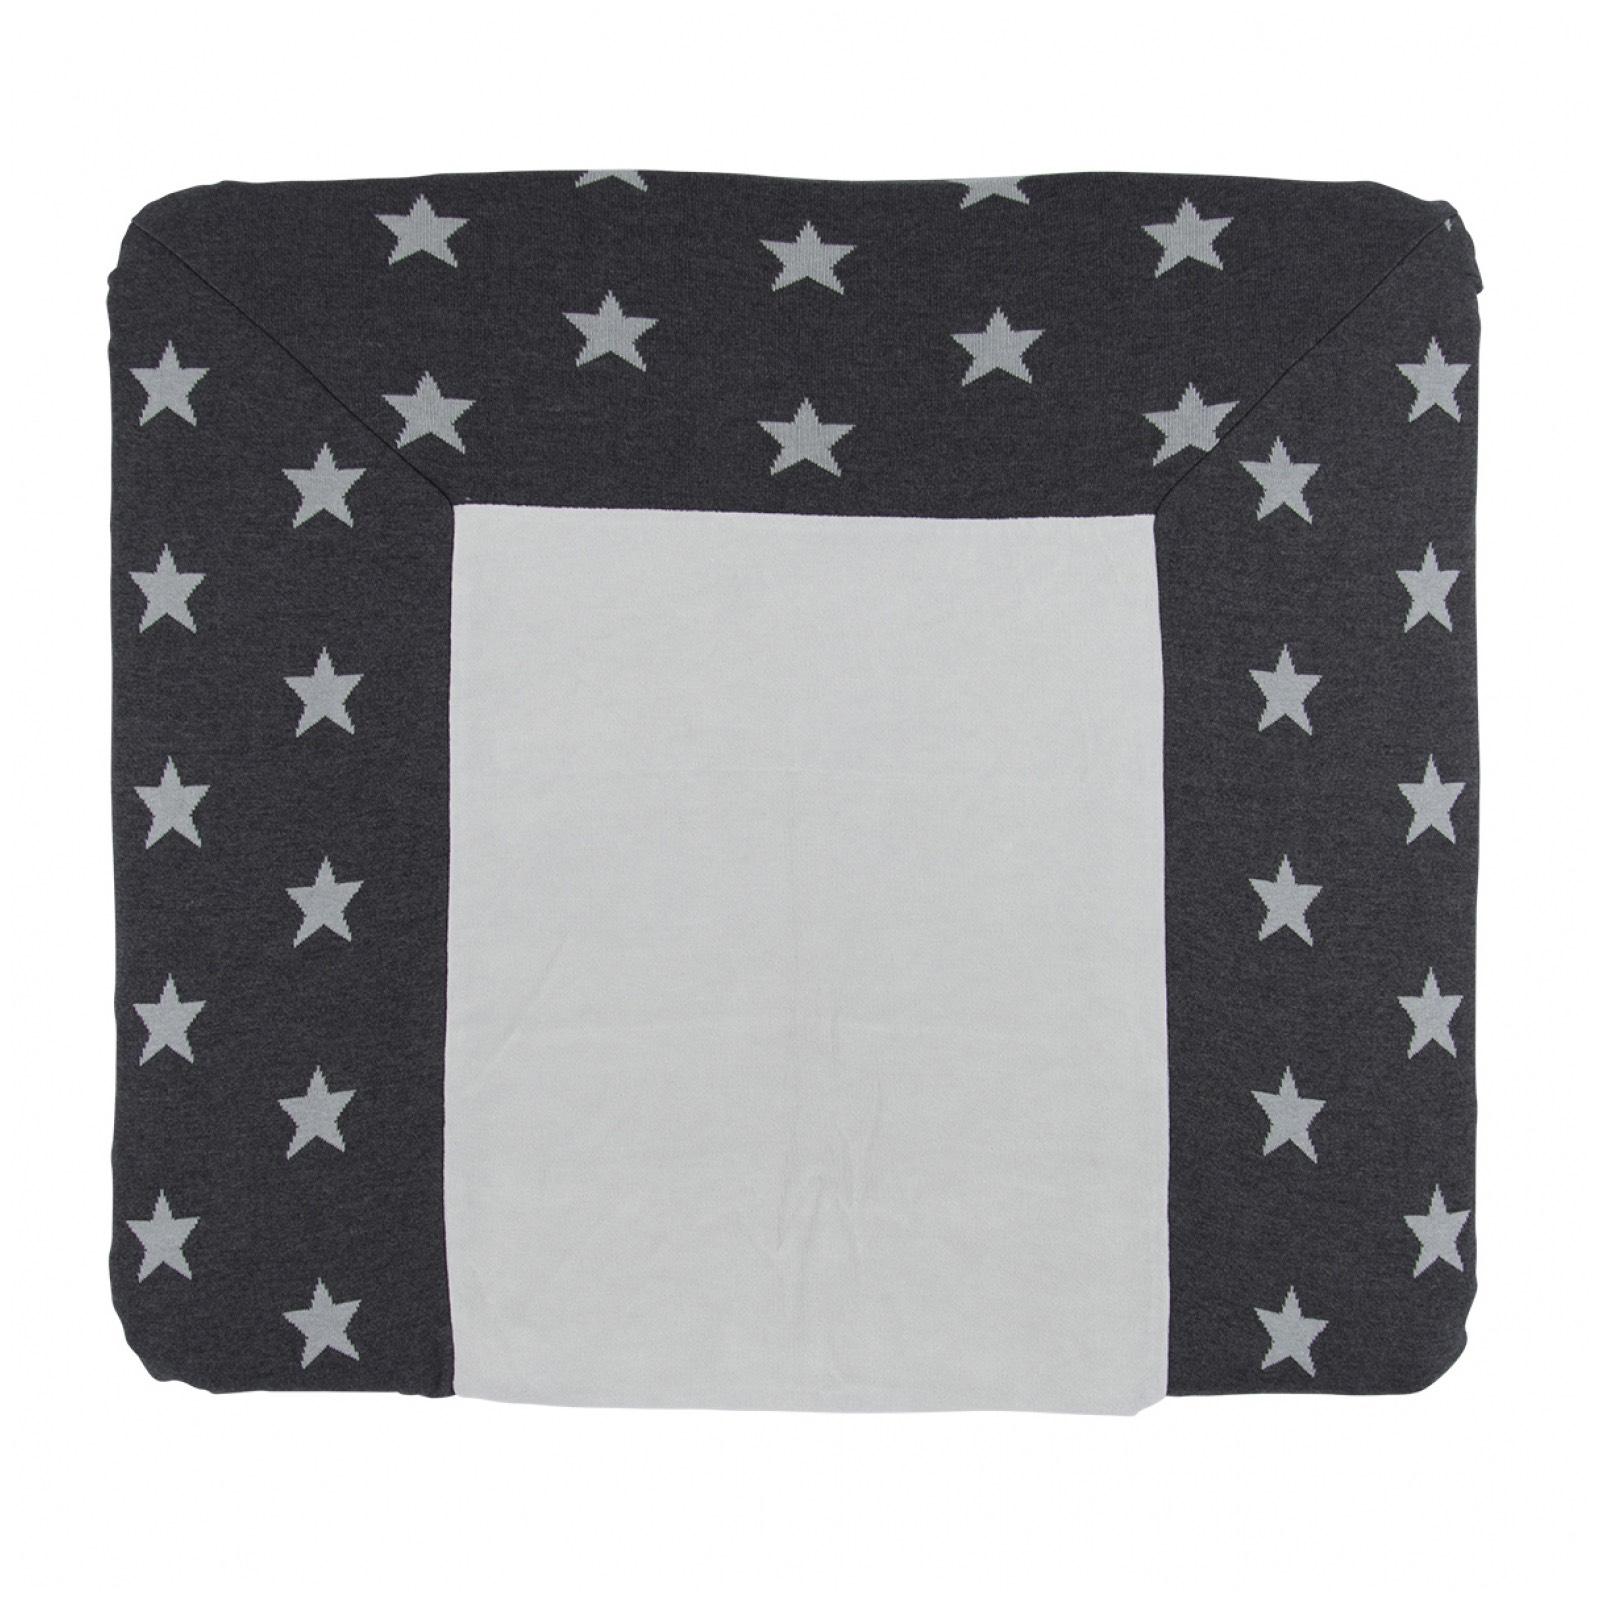 Wickelauflagenbezug Sterne anthrazit / grau (Gr. 75x85 cm)